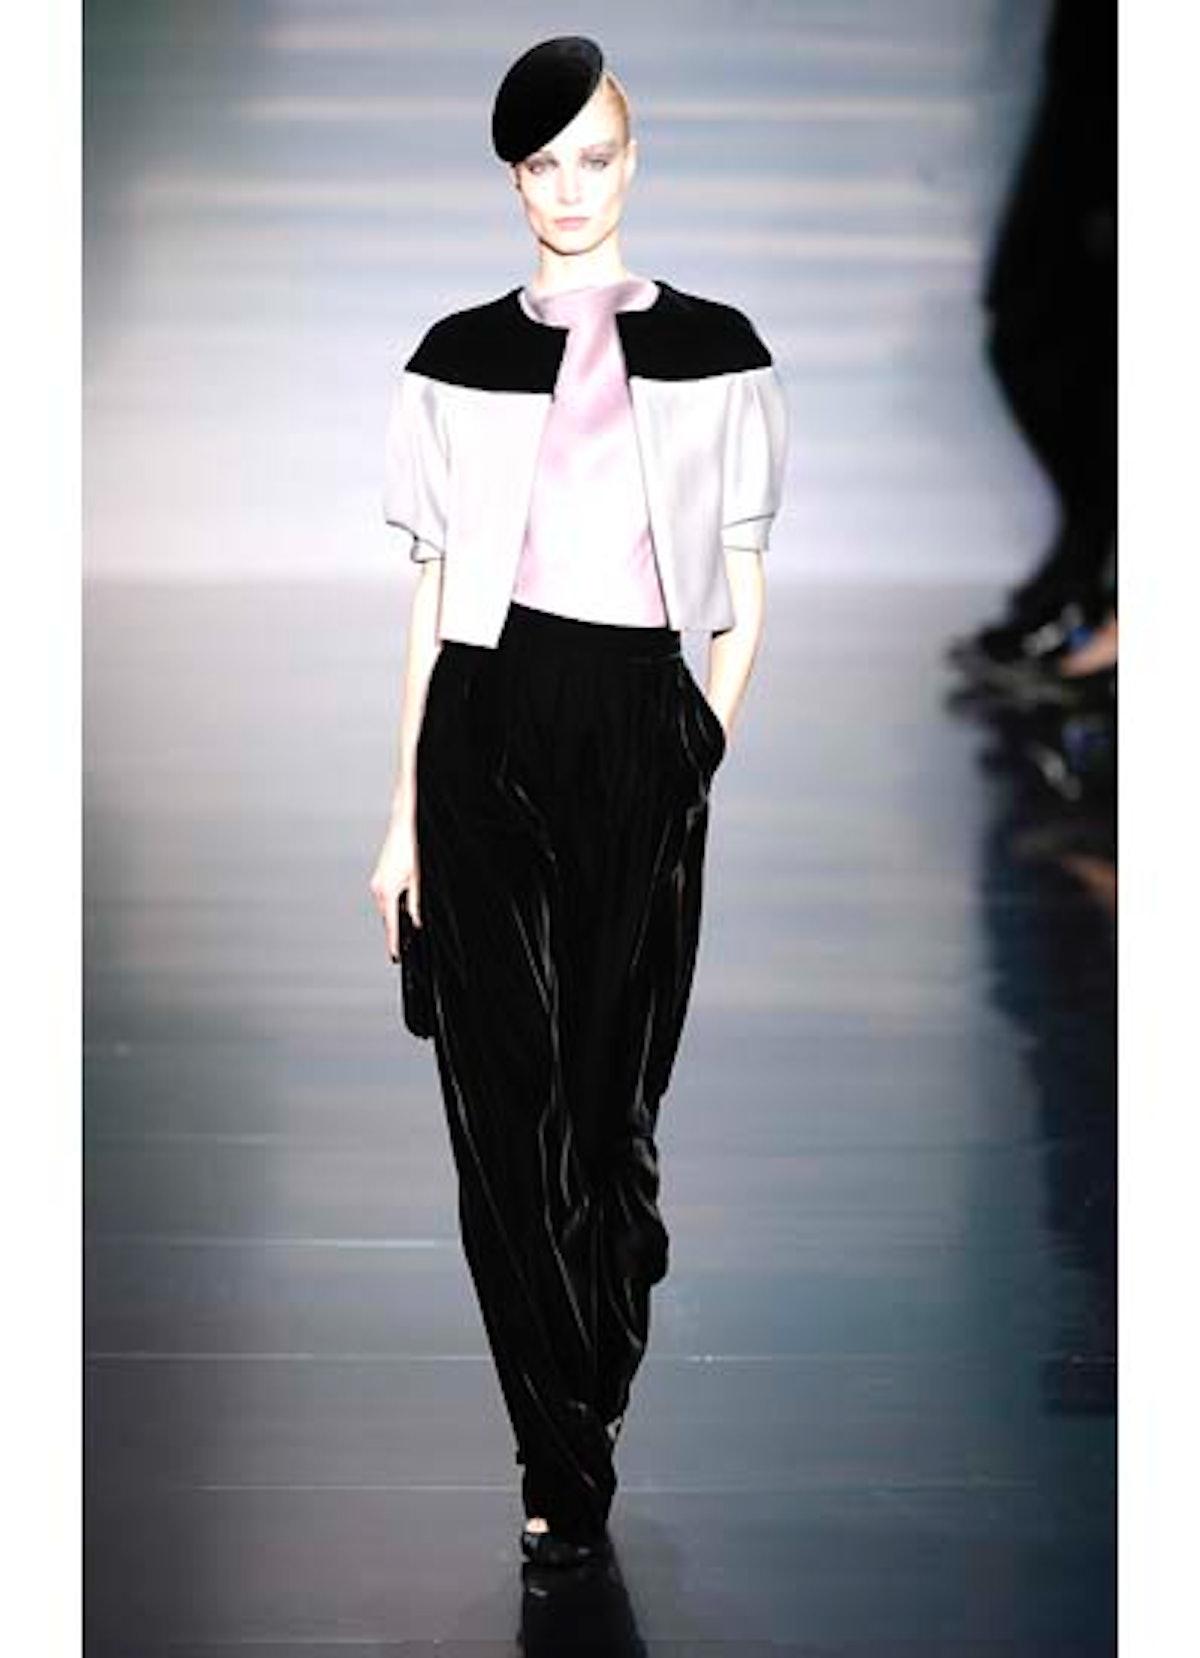 fass-giorgio-armani-couture-2012-runway-07-v.jpg